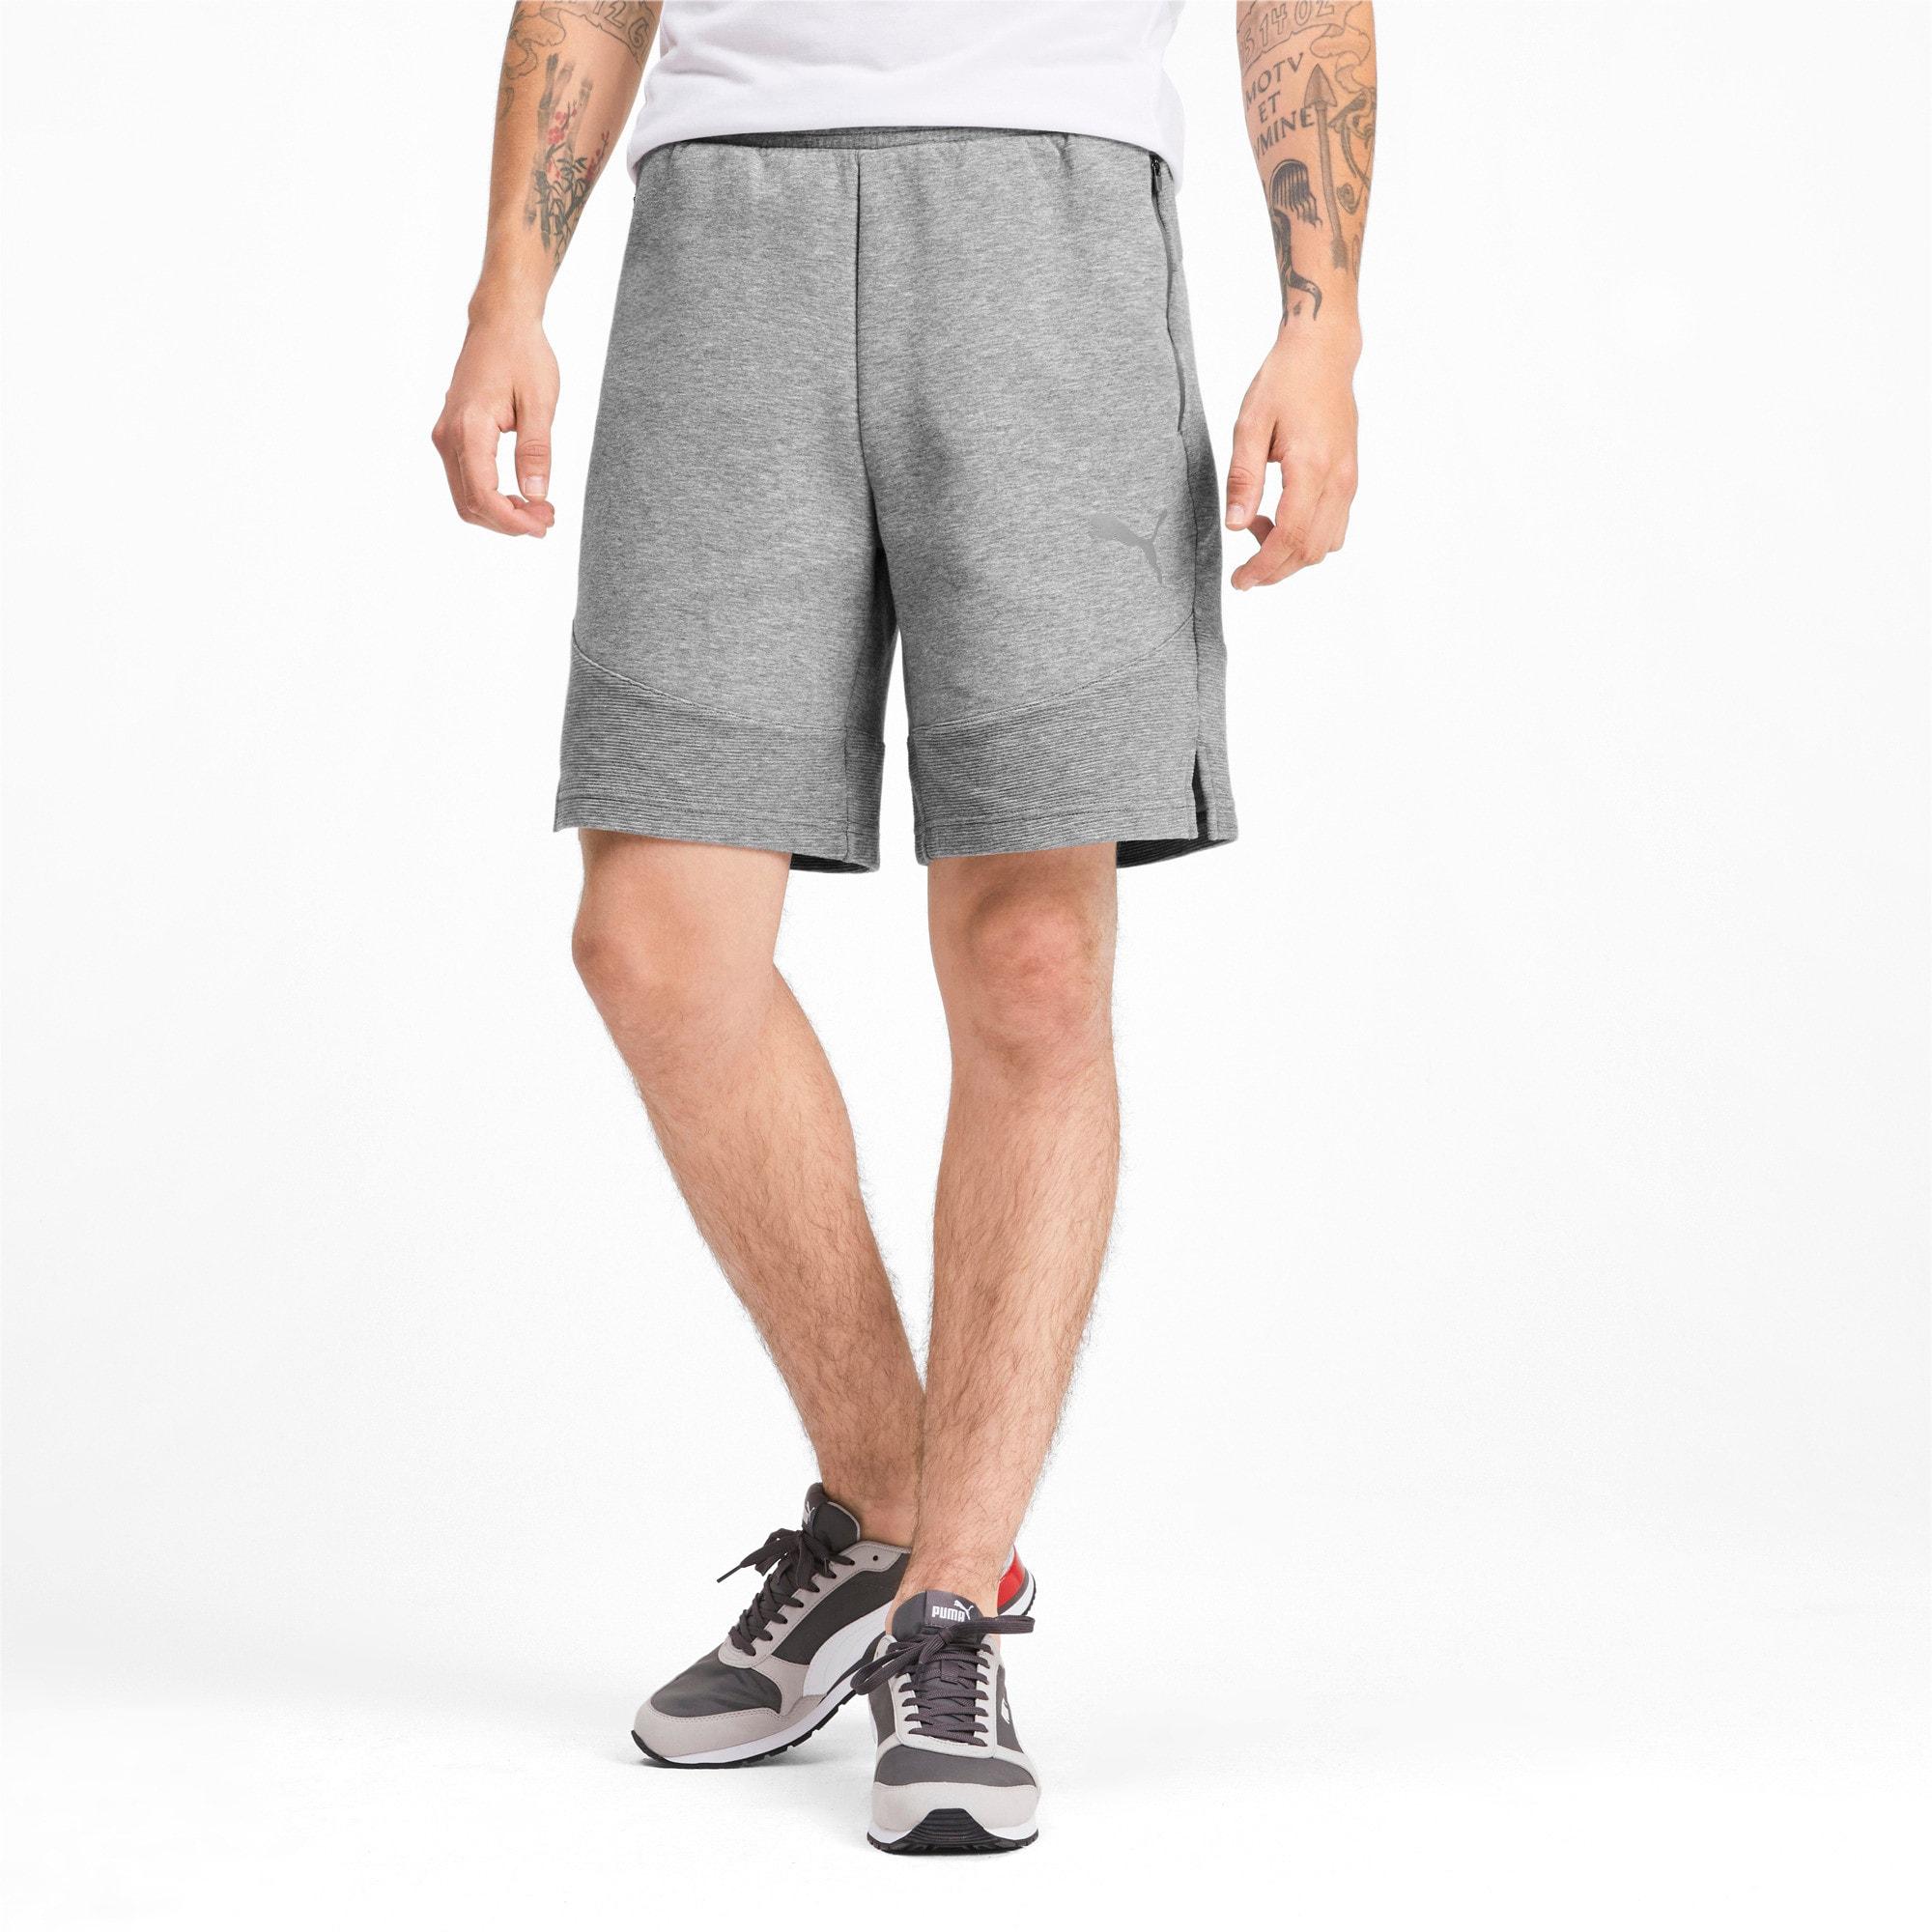 Thumbnail 1 of Evostripe Men's Shorts, Medium Gray Heather, medium